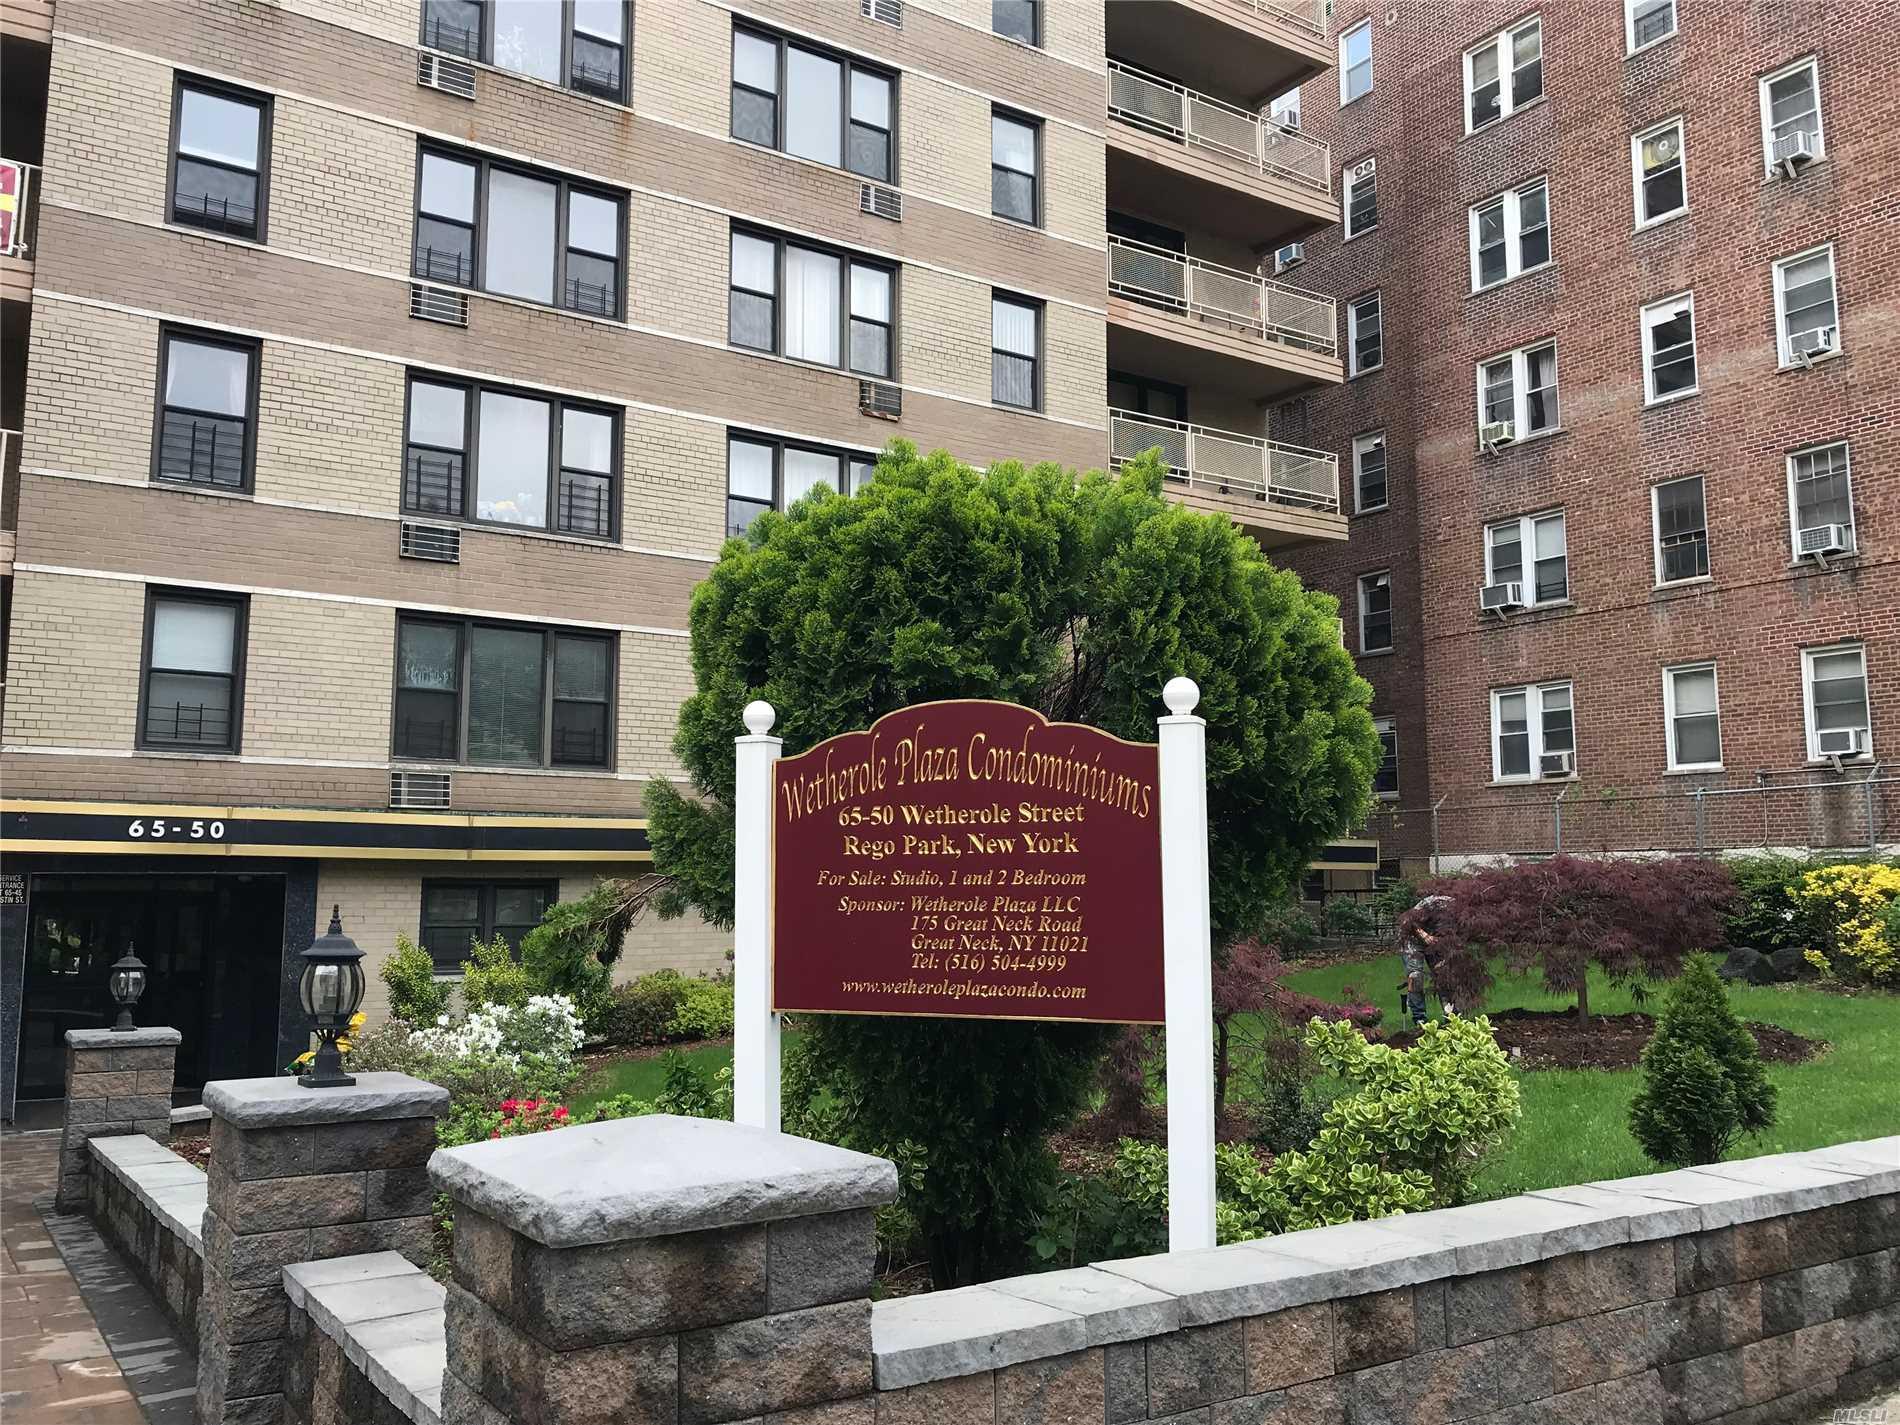 rego park catholic singles Resurrection ascension catholic academy 85-25 61st road rego park, new york 11374 7184264963.